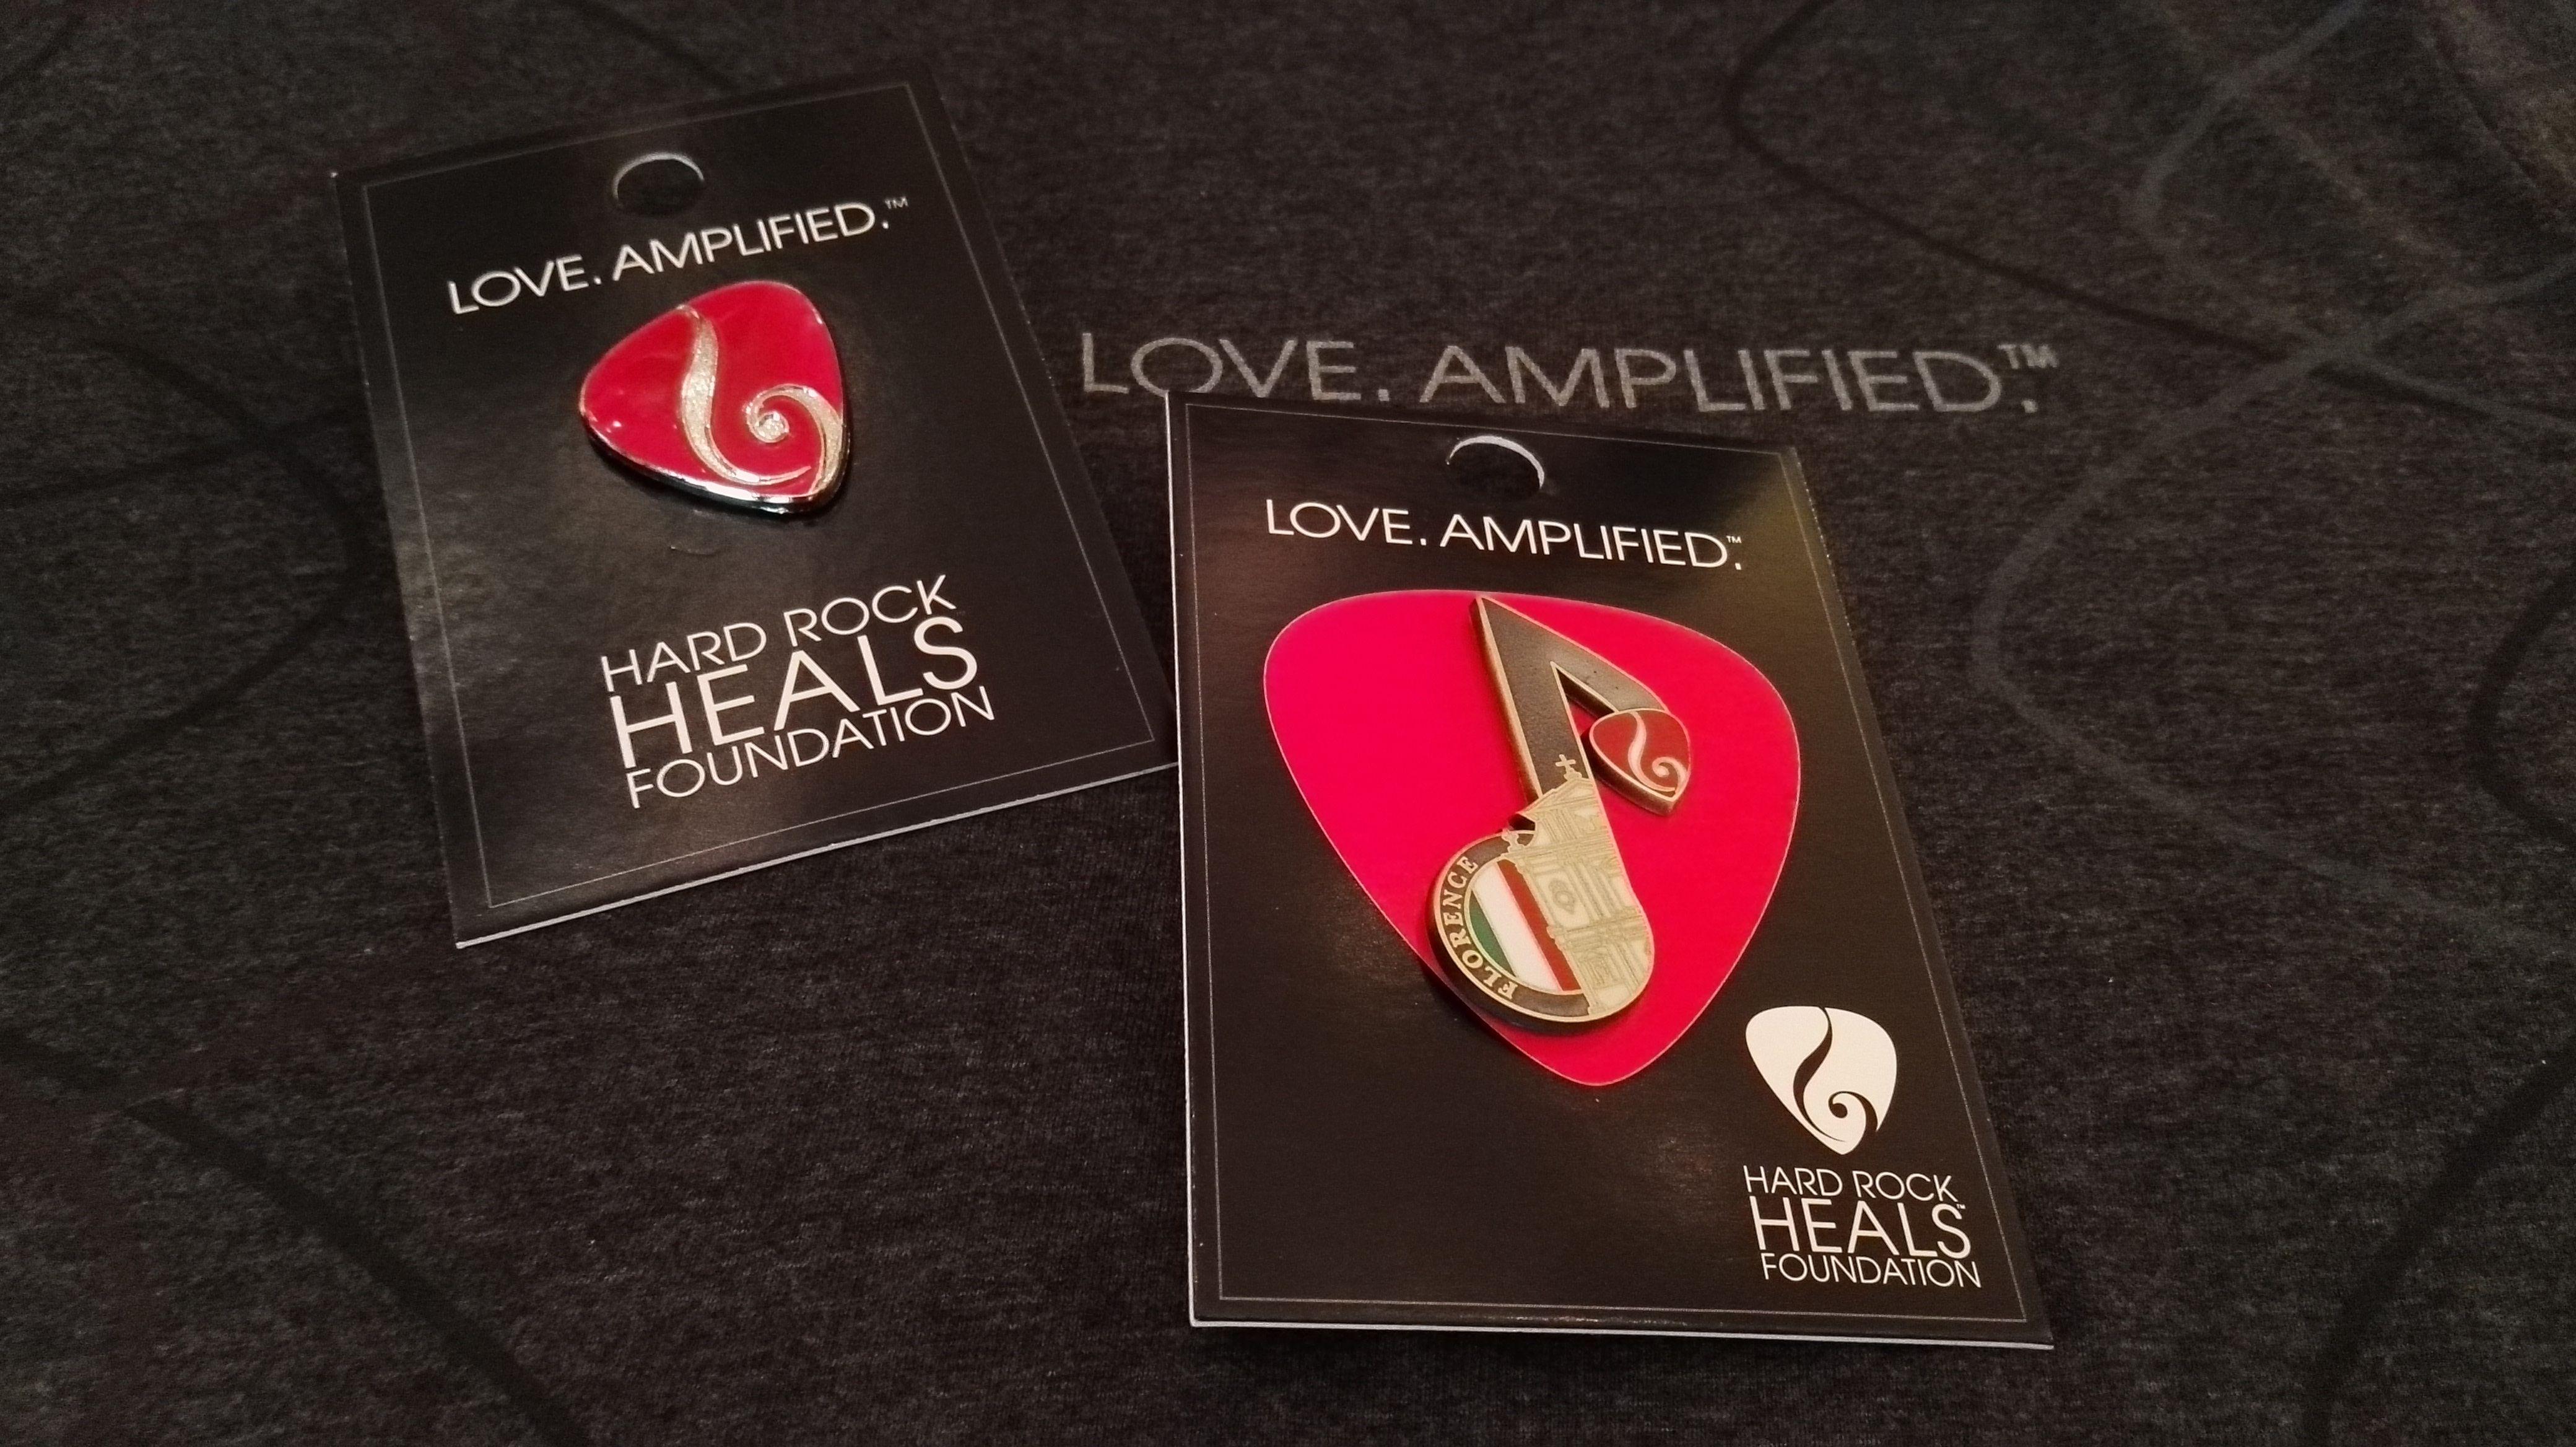 #HardRockHealsFoundation #LoveAmplified